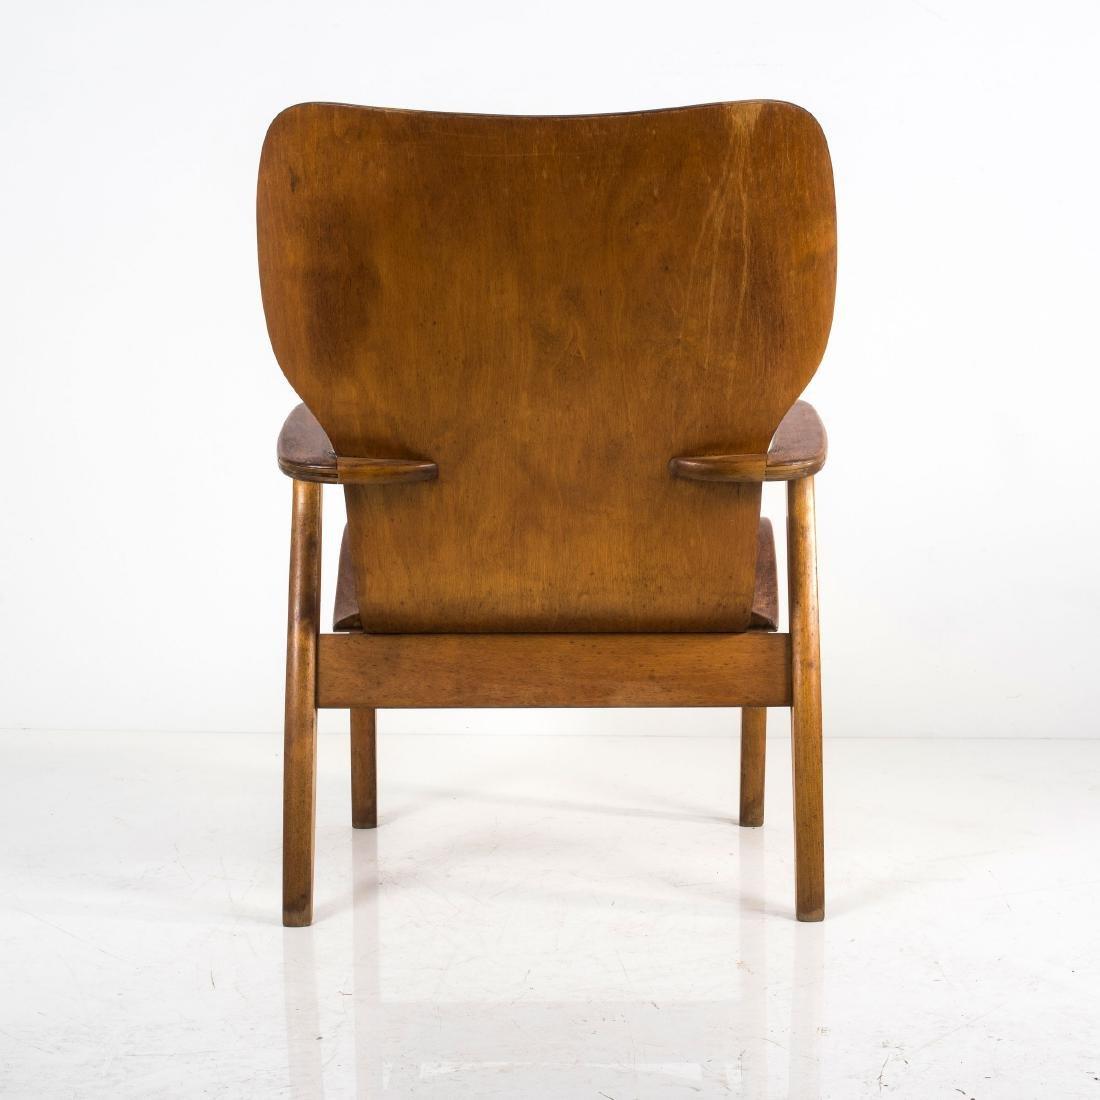 Armchair 'Domus Lux', c1948 - 7